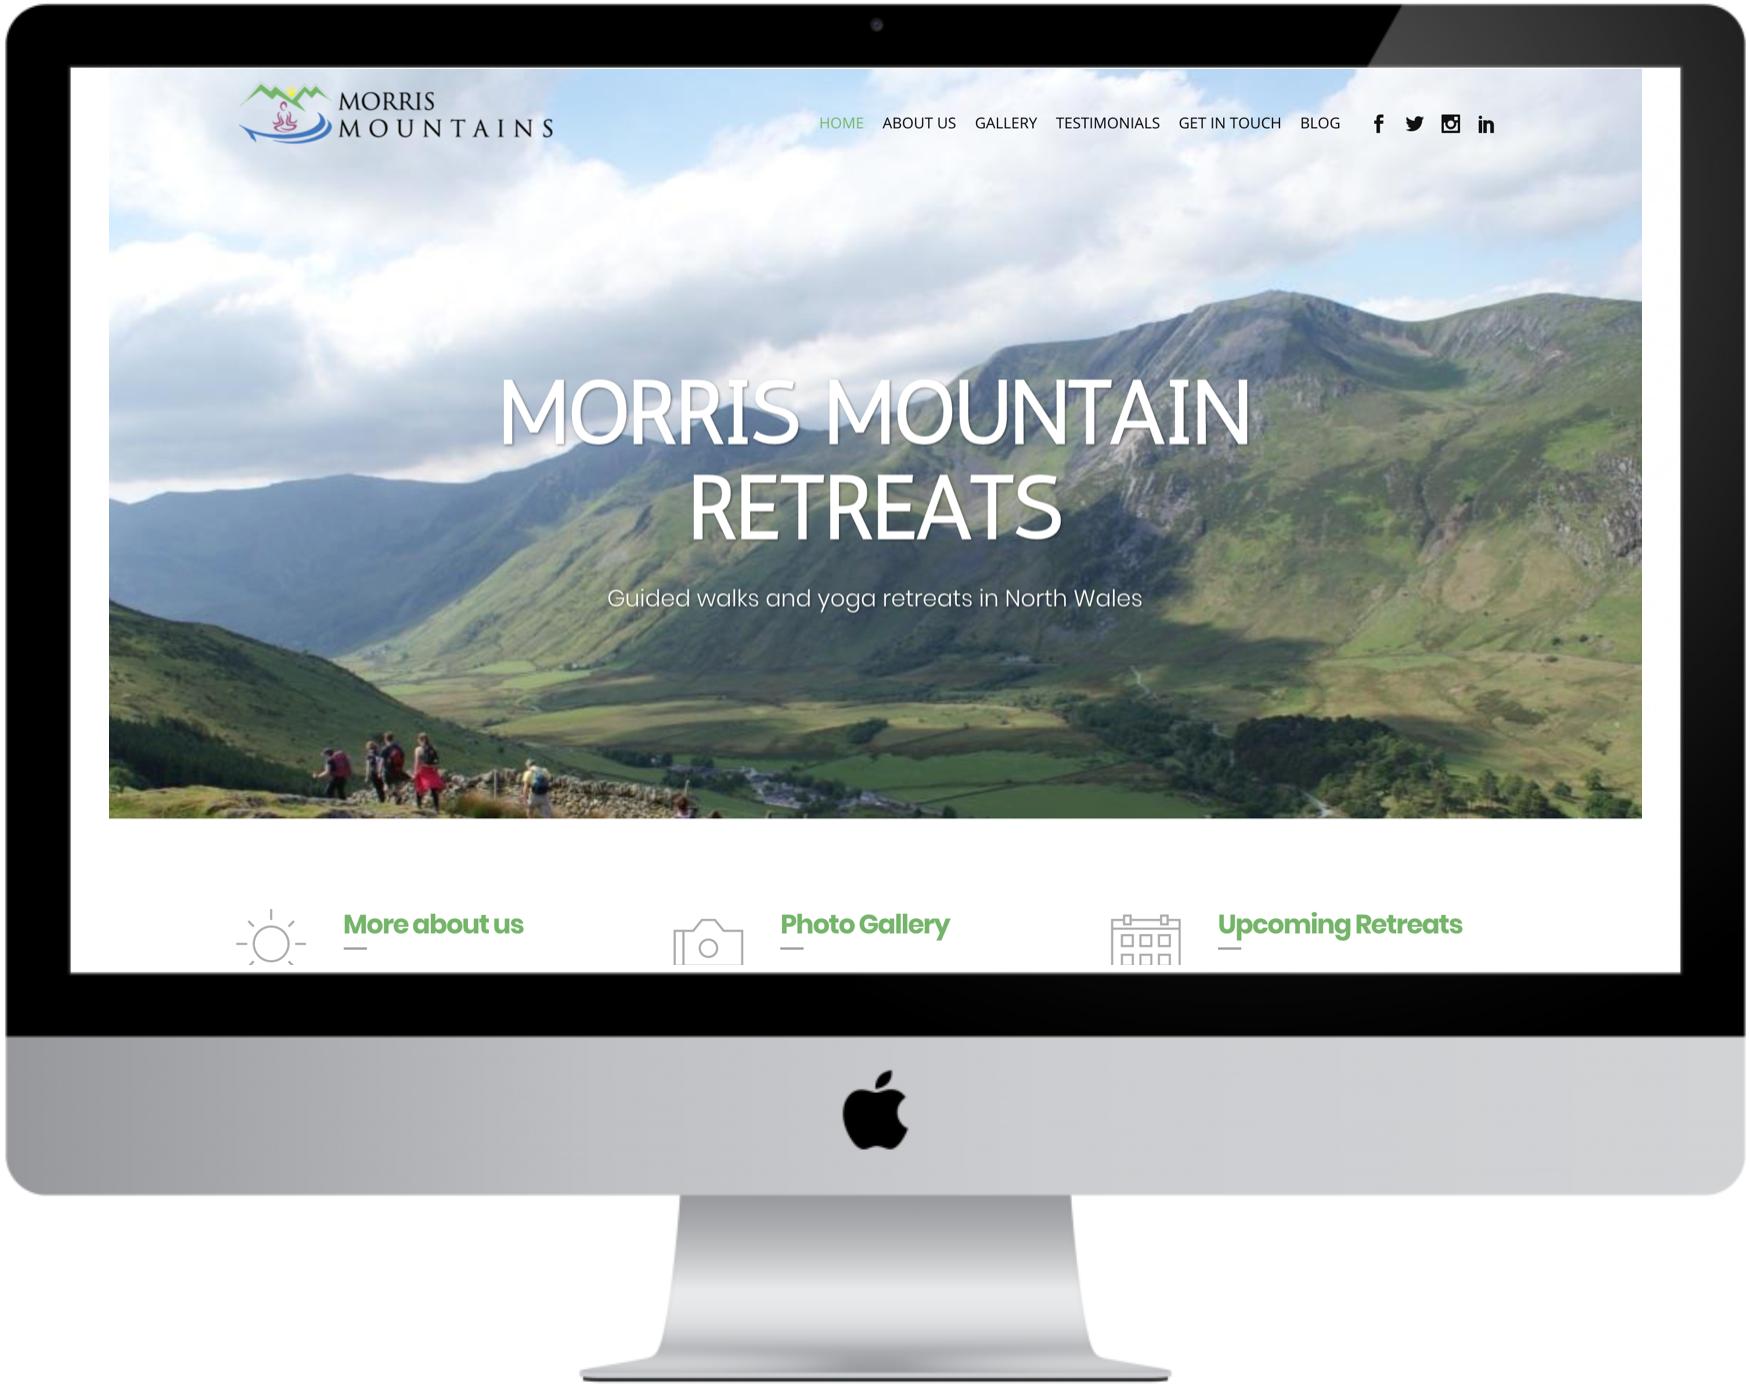 Visit Morris Mountain's website  here